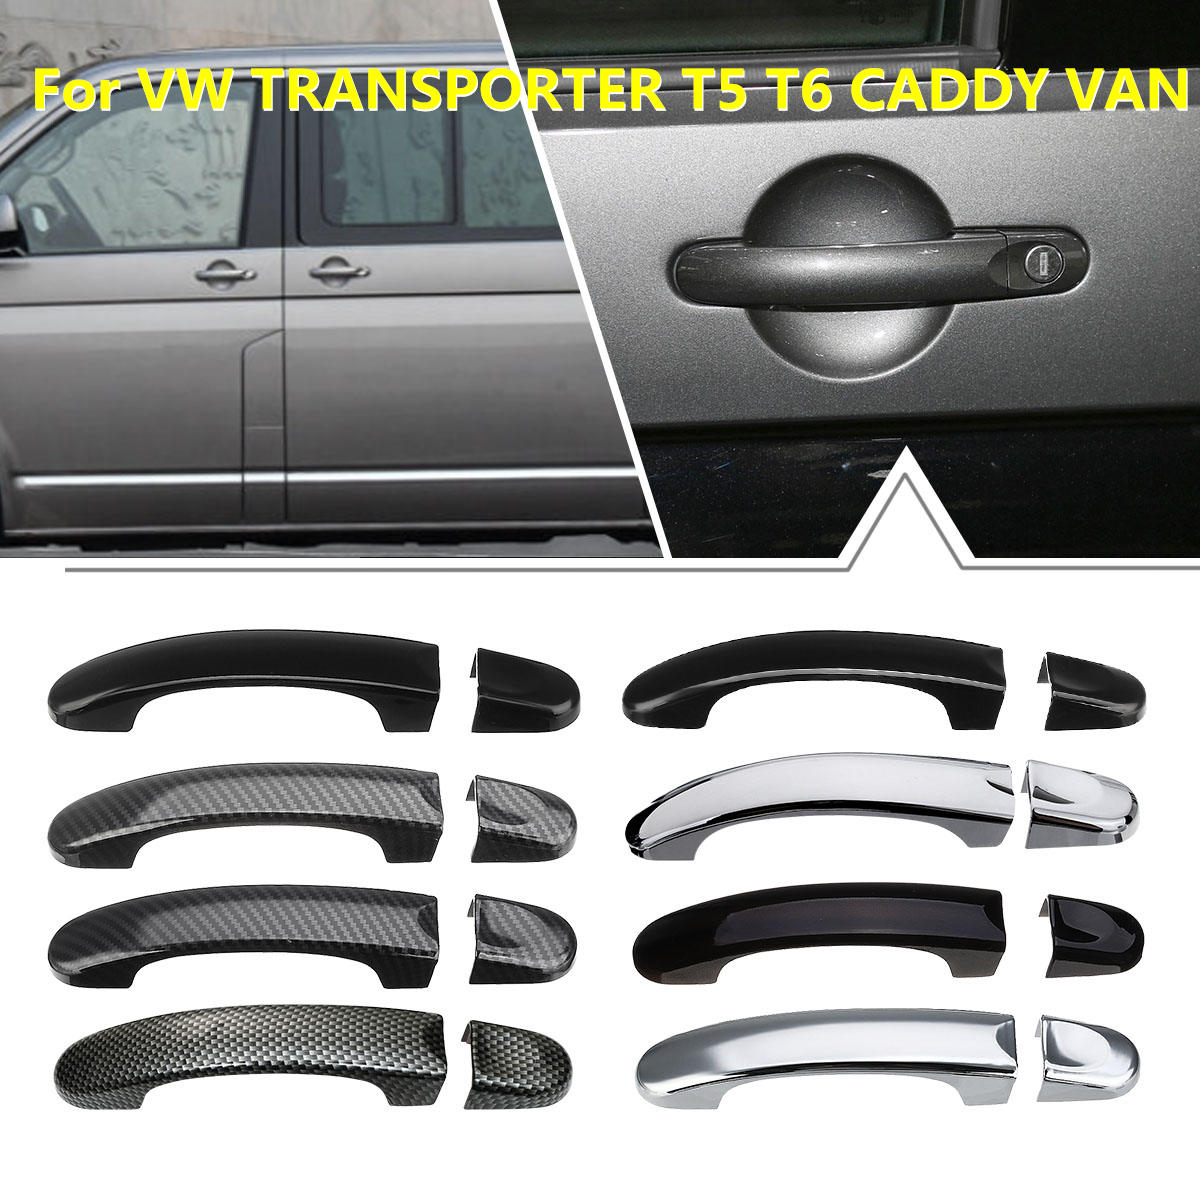 Side loading door interior handle and trim Right Volkswagen Transporter T5 T6